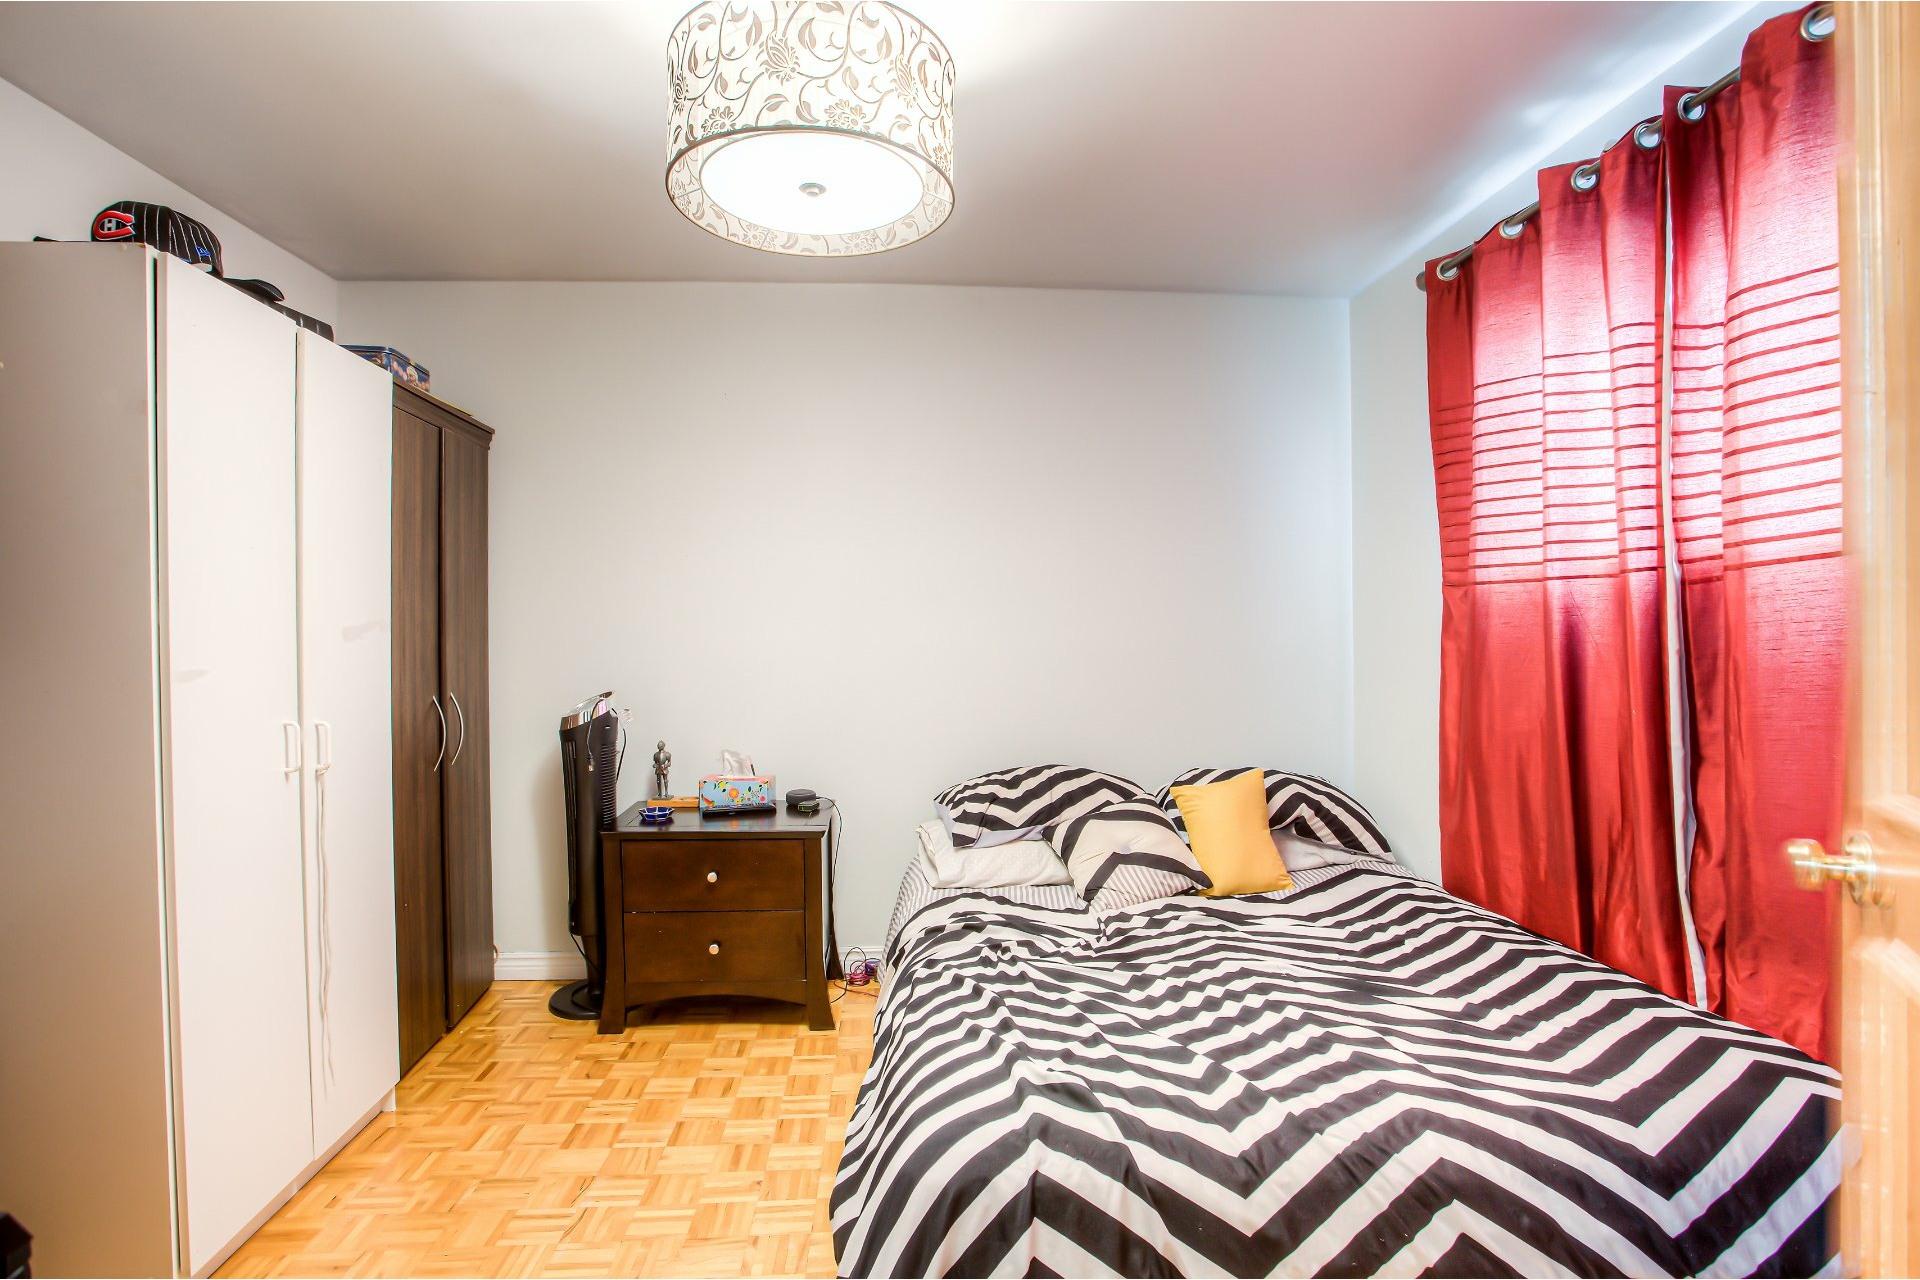 image 13 - MX - Casa sola - MX En venta Dollard-Des Ormeaux - 11 habitaciones